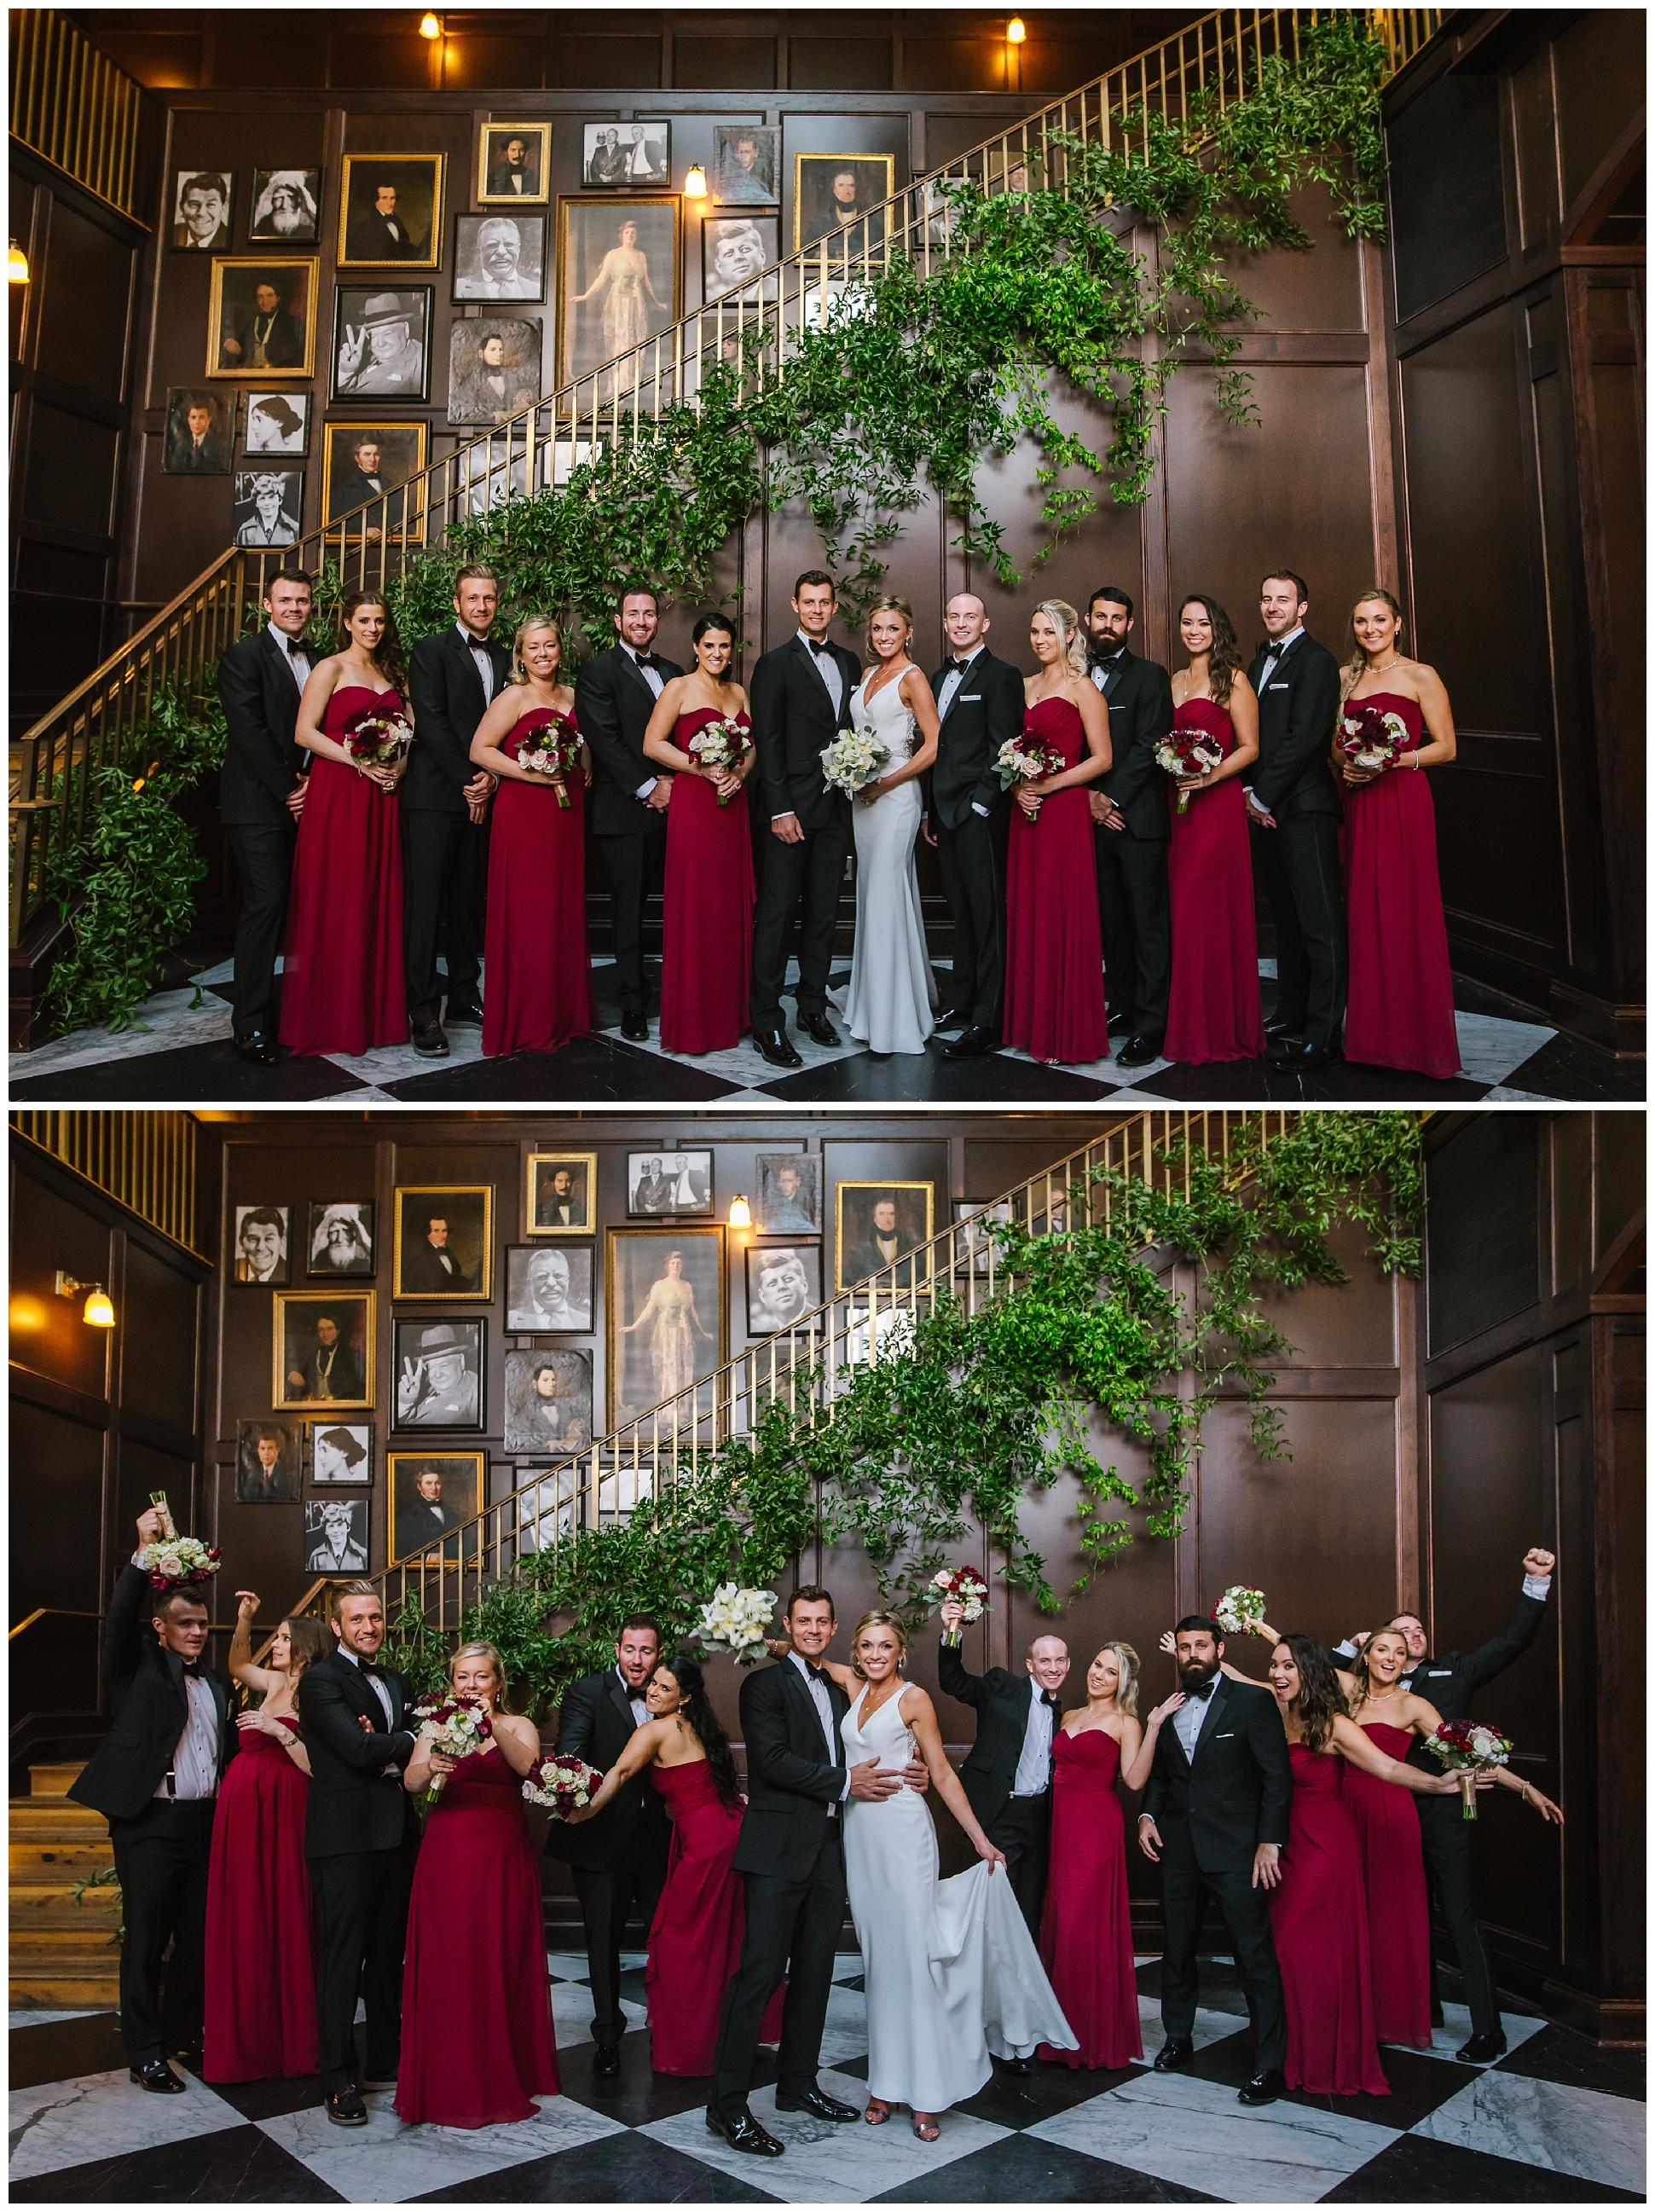 Oxford-exchange-wedding-photogapher-garland-candels-bookstore-burgandy-botanica_0032.jpg